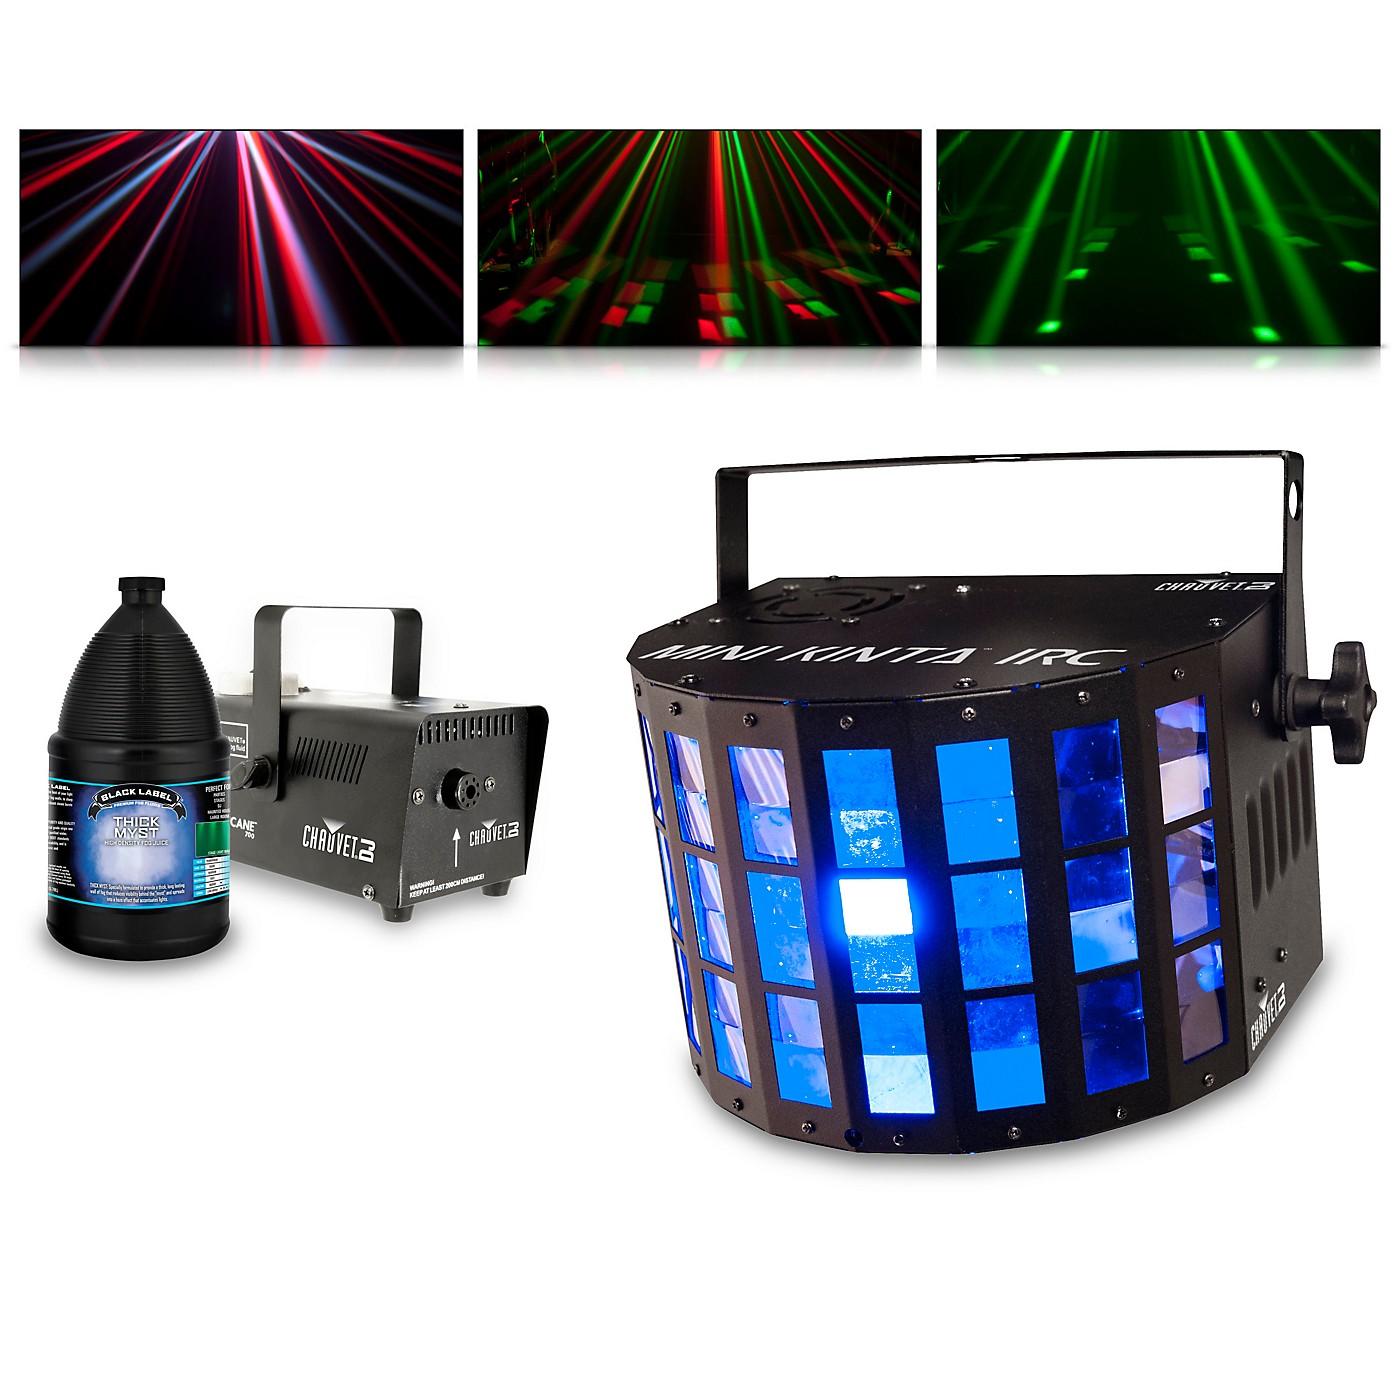 CHAUVET DJ Mini Kinta IRC with Hurricane 700 Fog Machine and Juice thumbnail